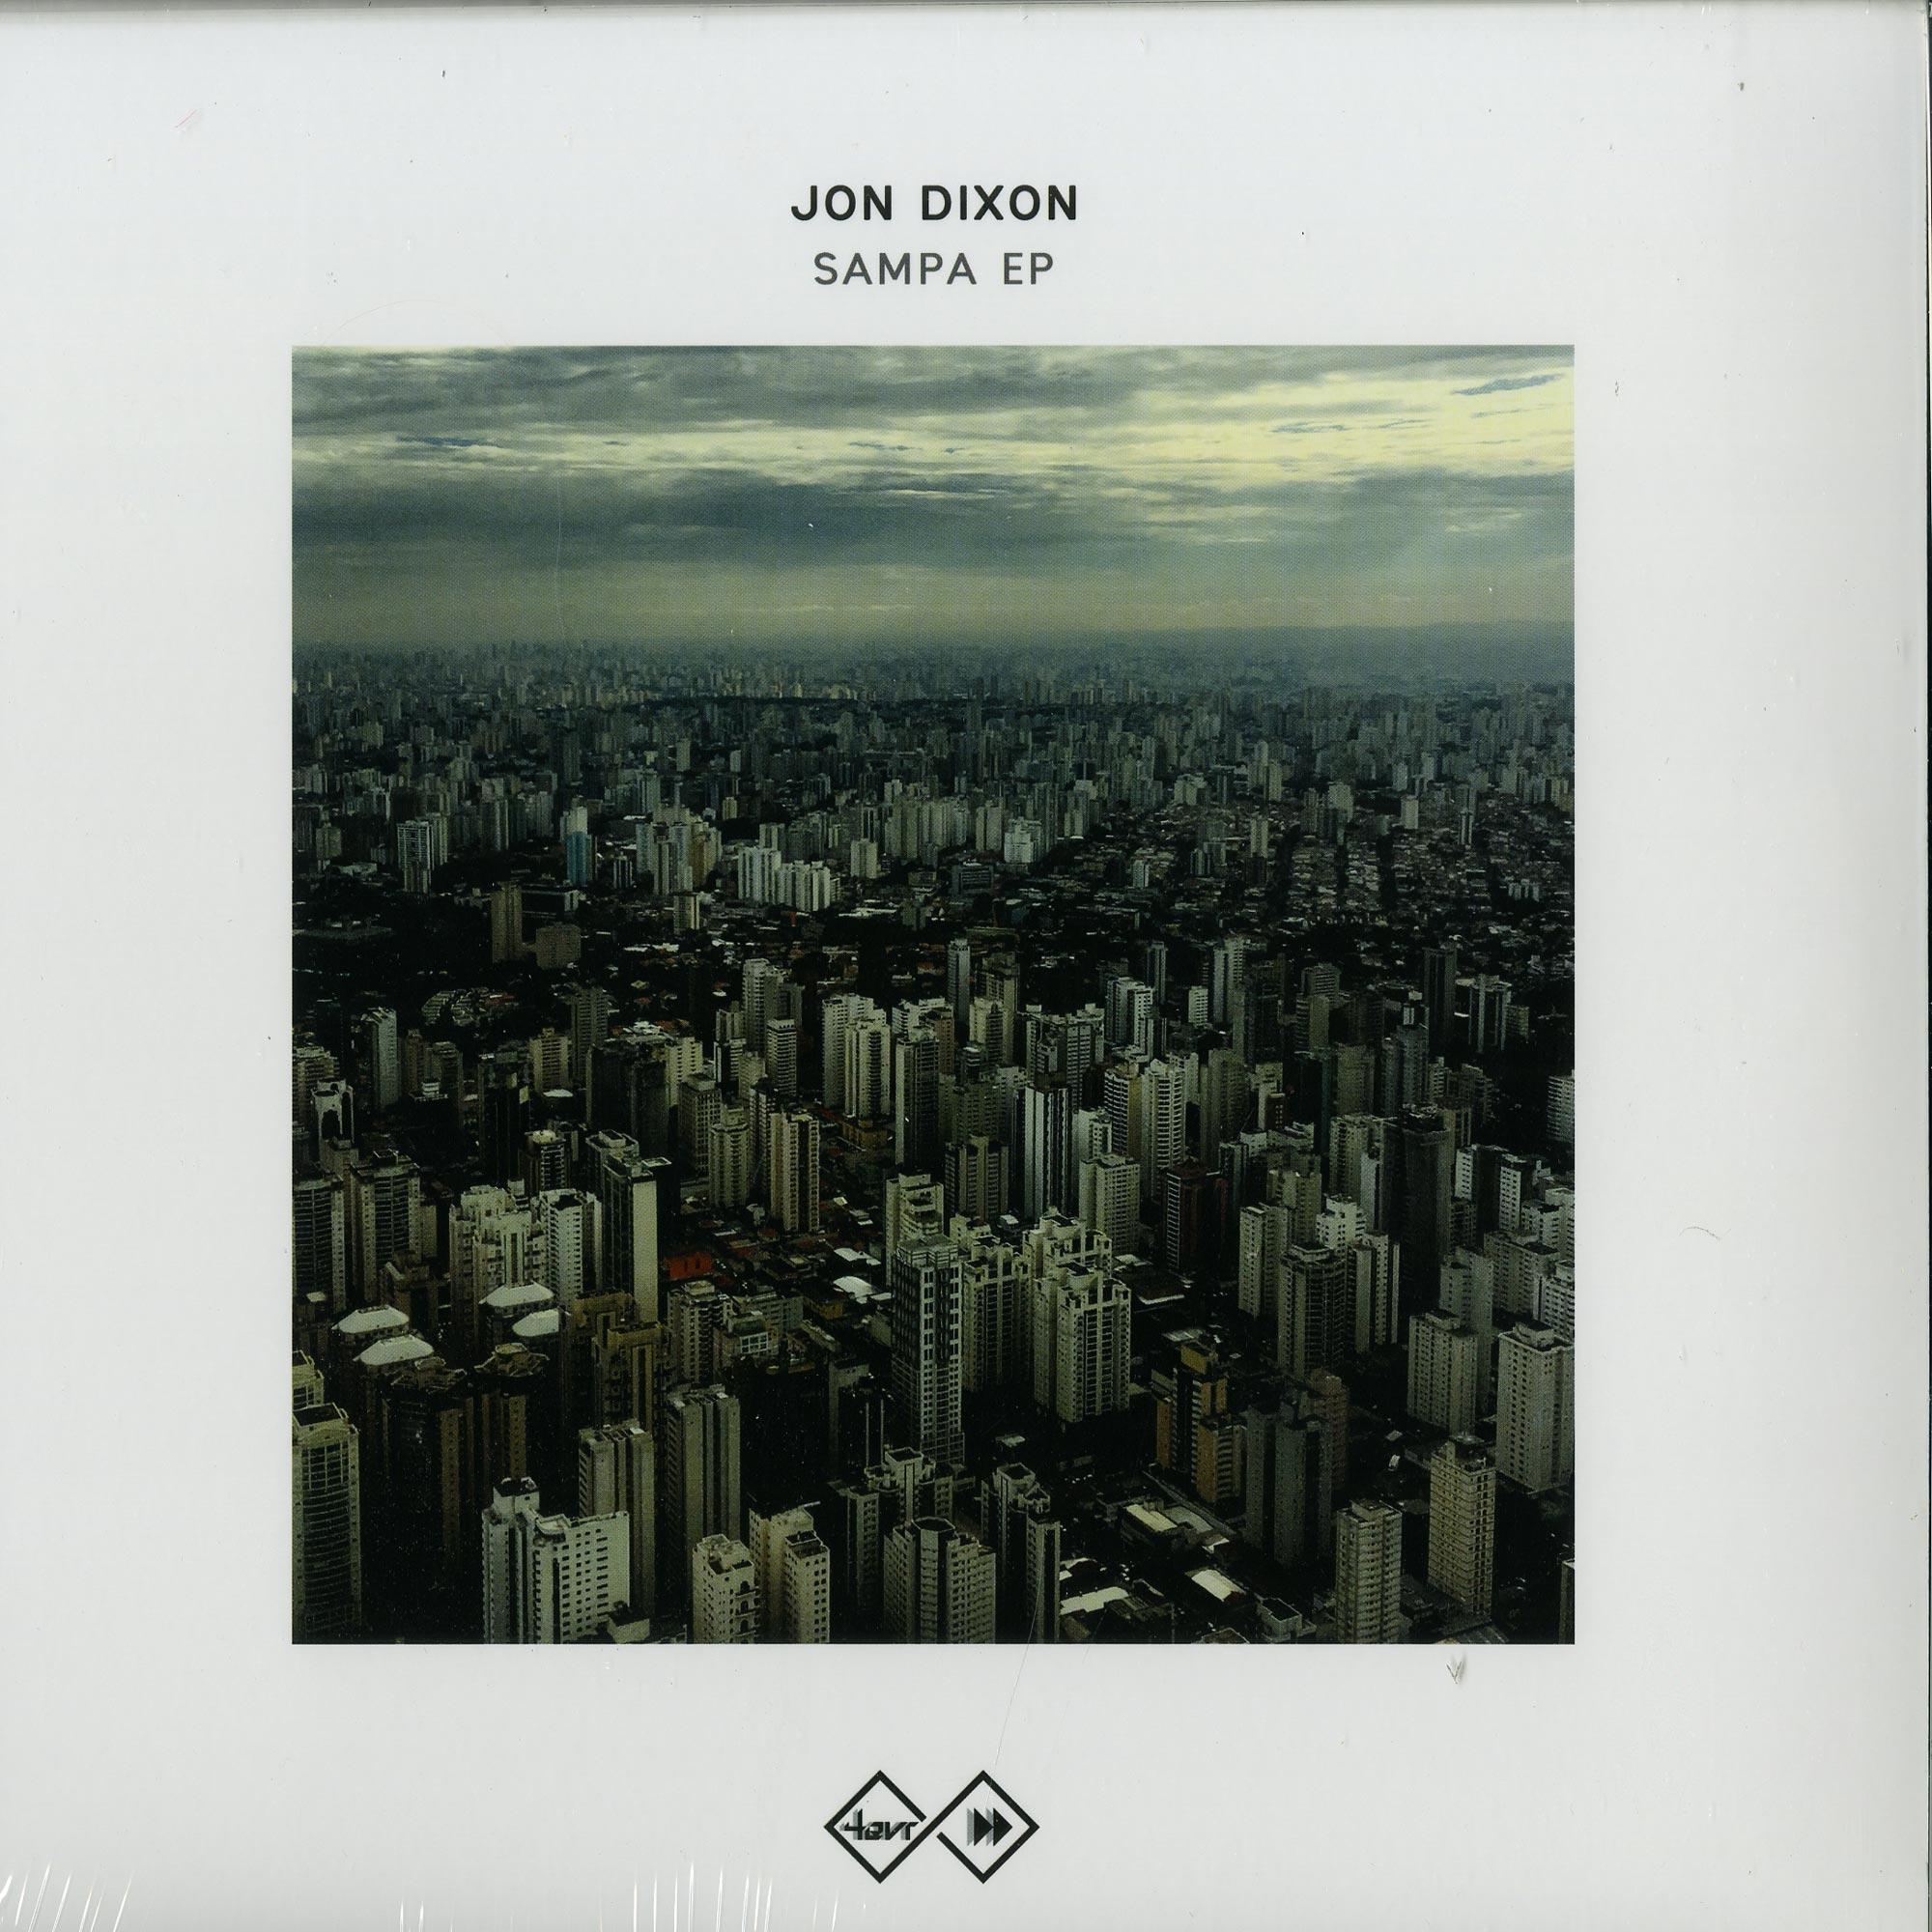 Jon Dixon - SAMPHA EP